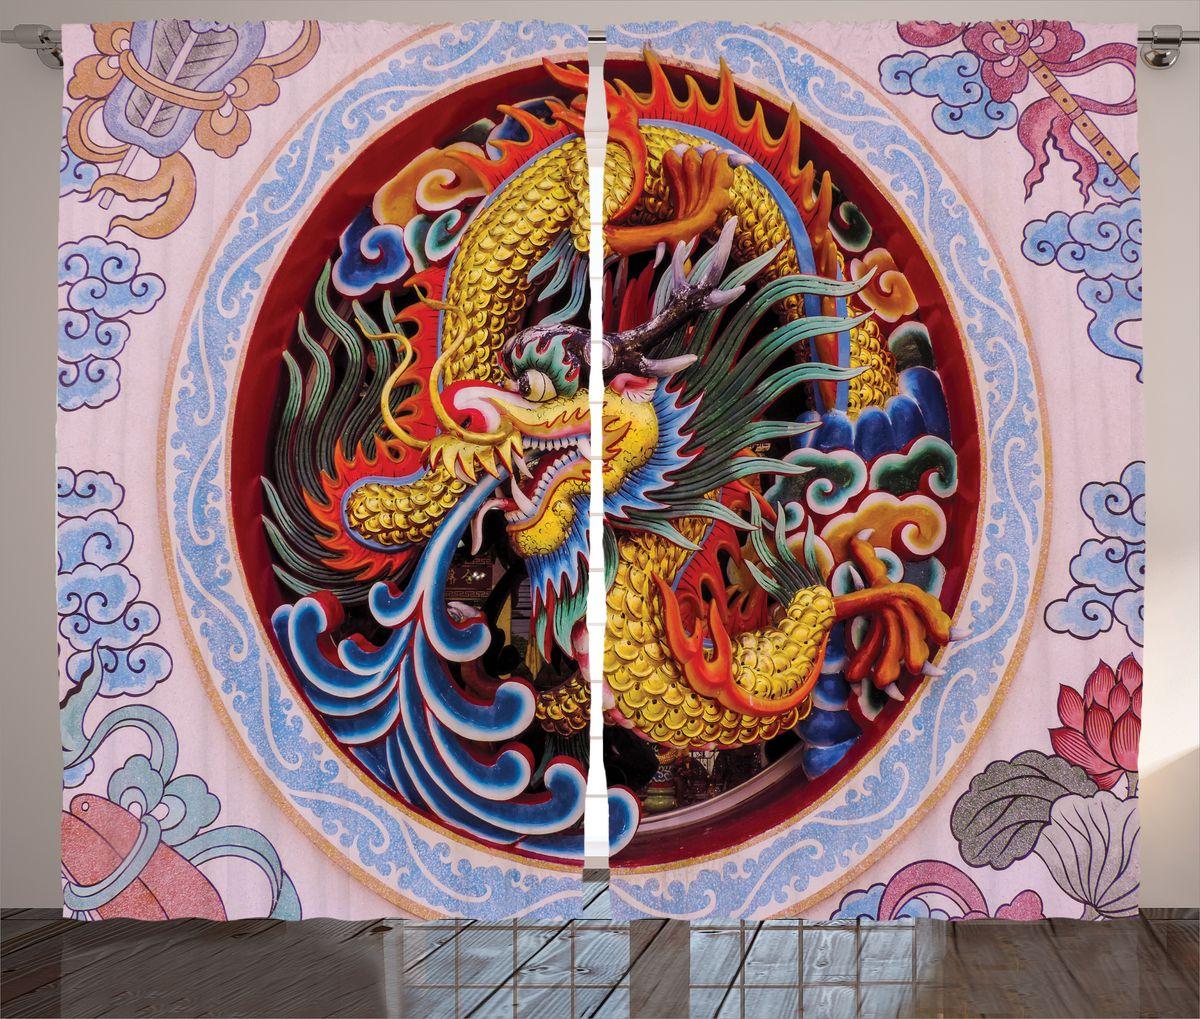 "Комплект фотоштор Magic Lady ""Китайский дракон"", на ленте, высота 265 см. шсг_17907"